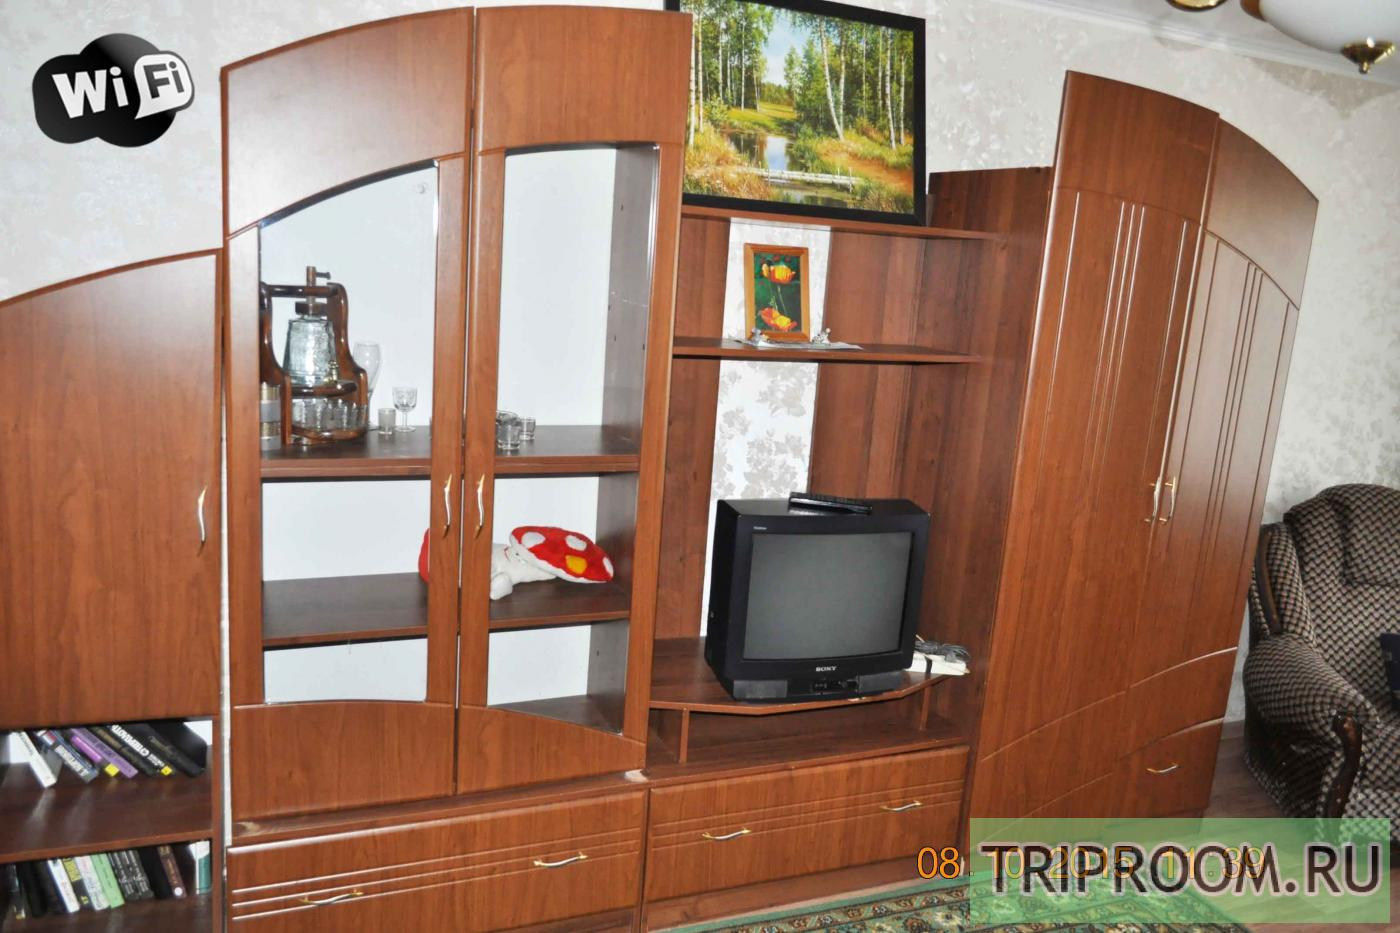 2-комнатная квартира посуточно (вариант № 11708), ул. Амосова улица, фото № 18